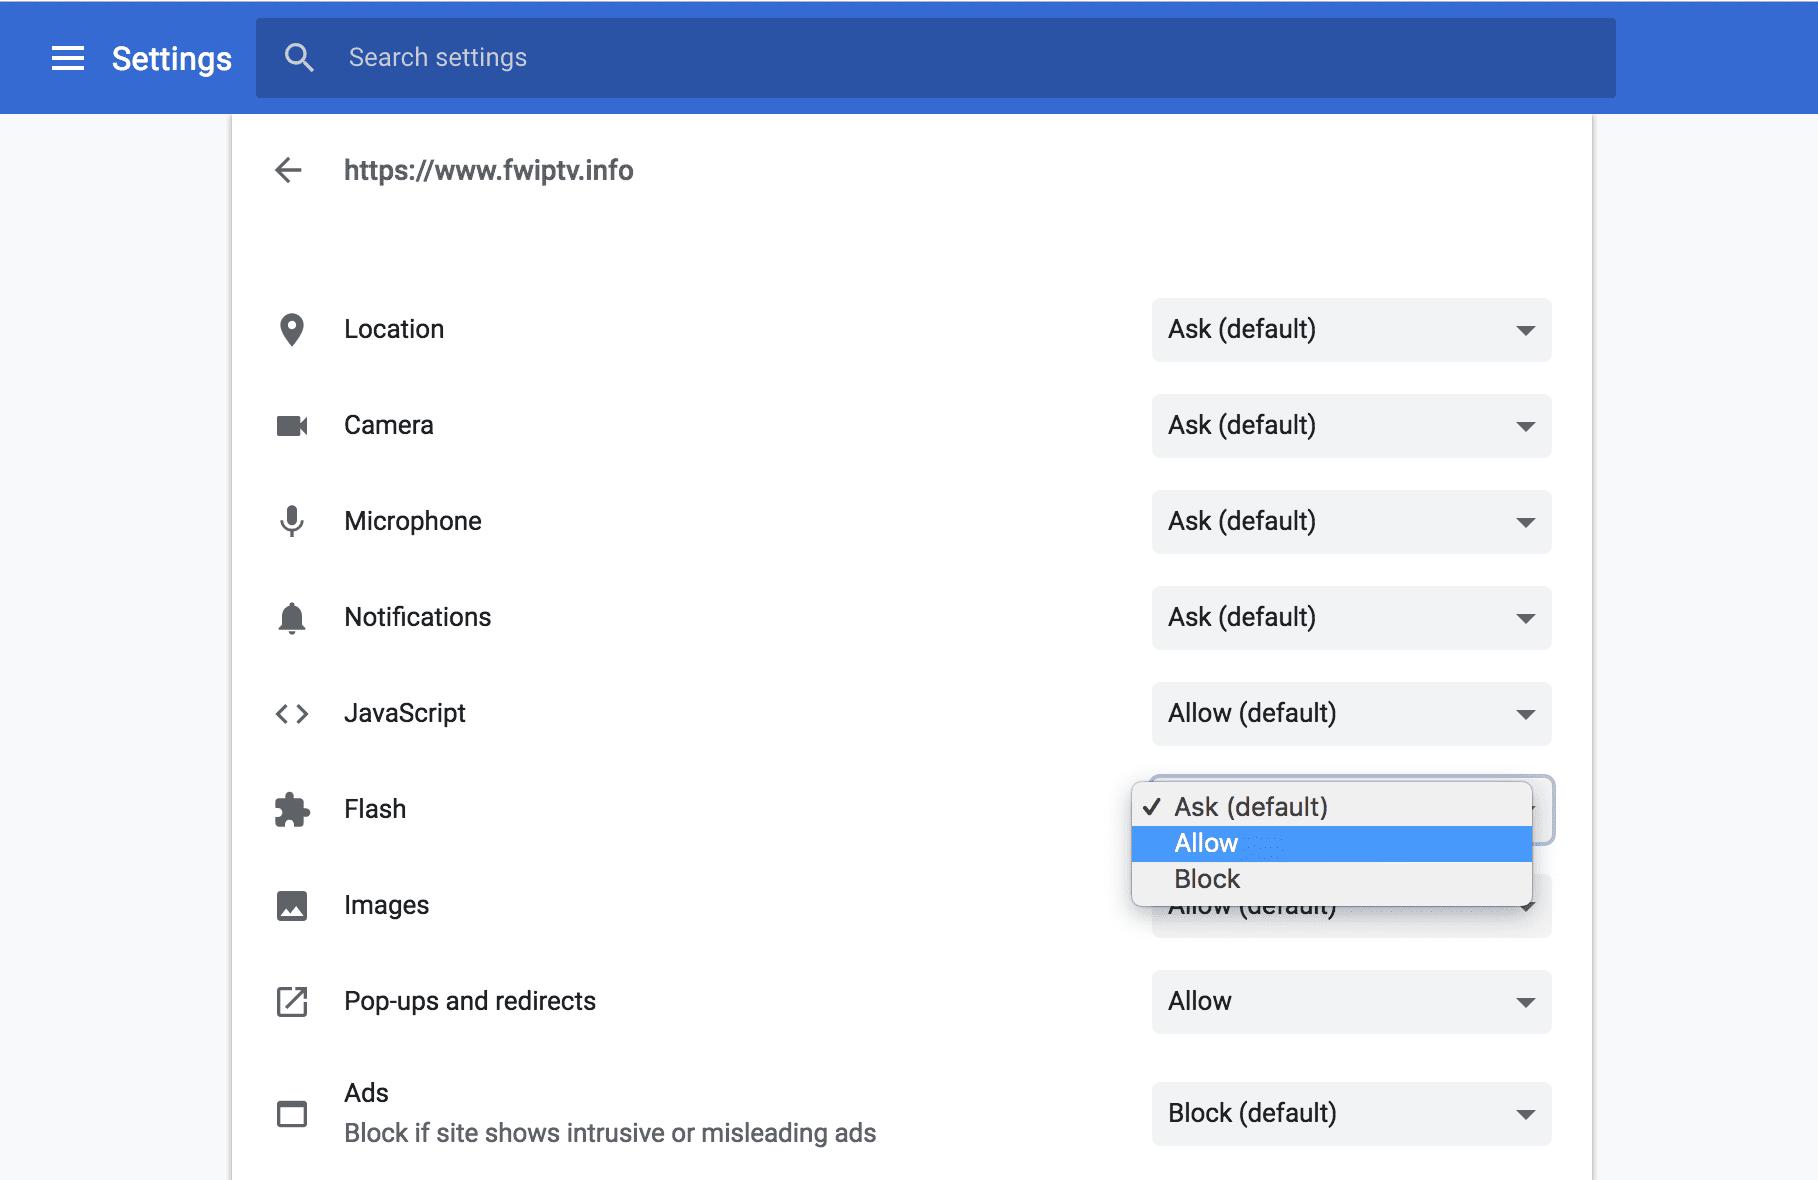 FlashPlayer Setting Chrome